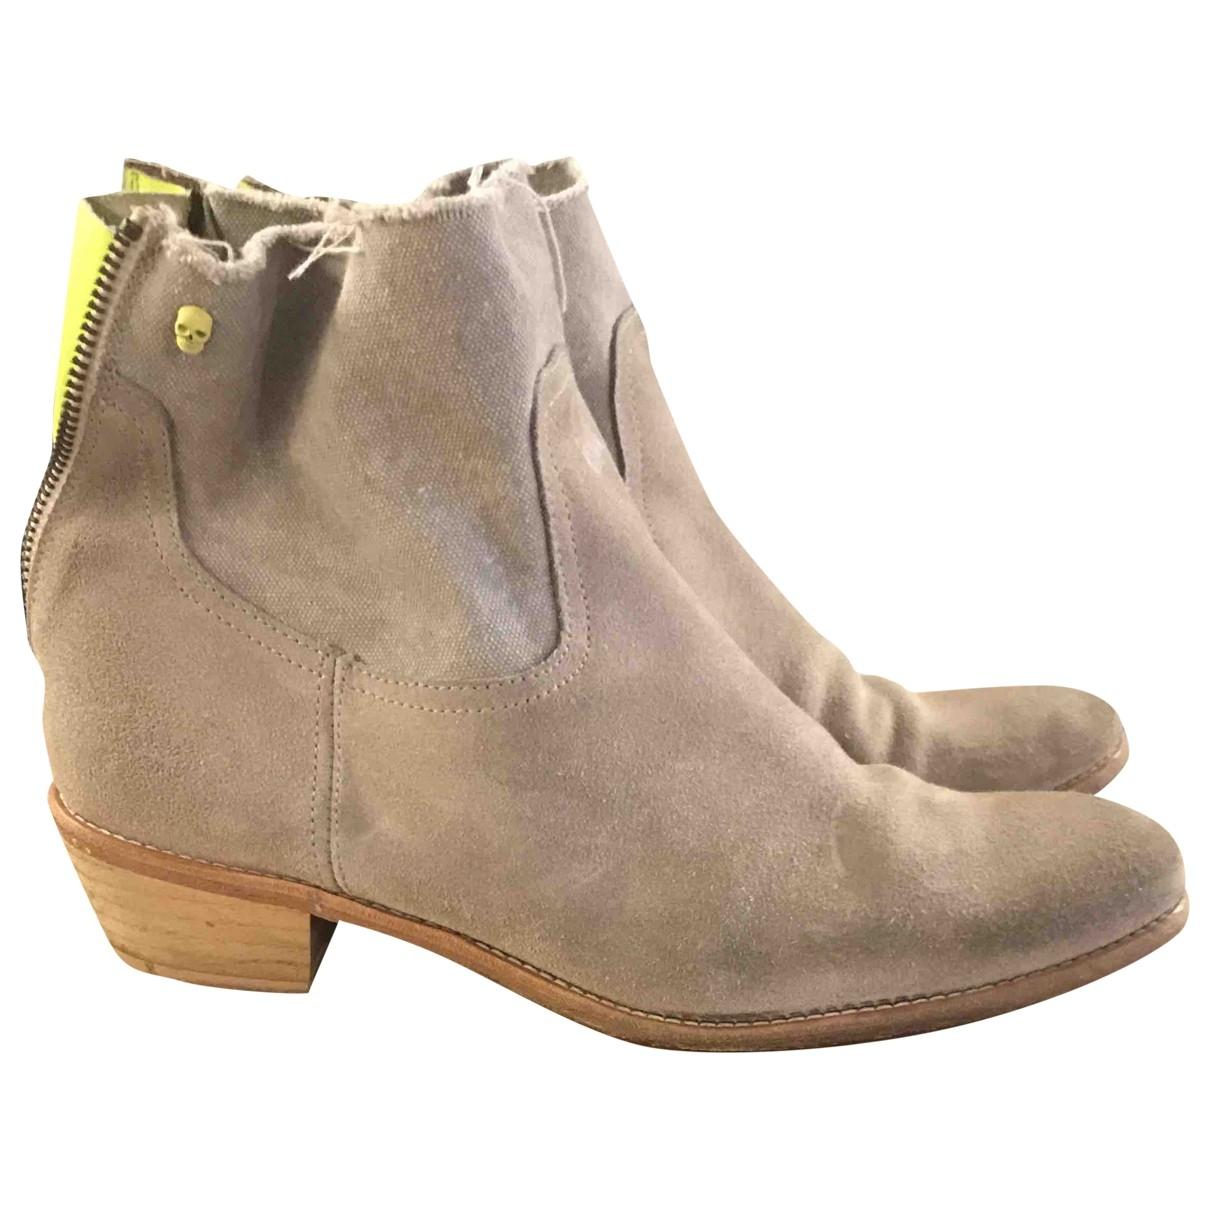 Zadig & Voltaire - Boots Teddy pour femme en suede - beige